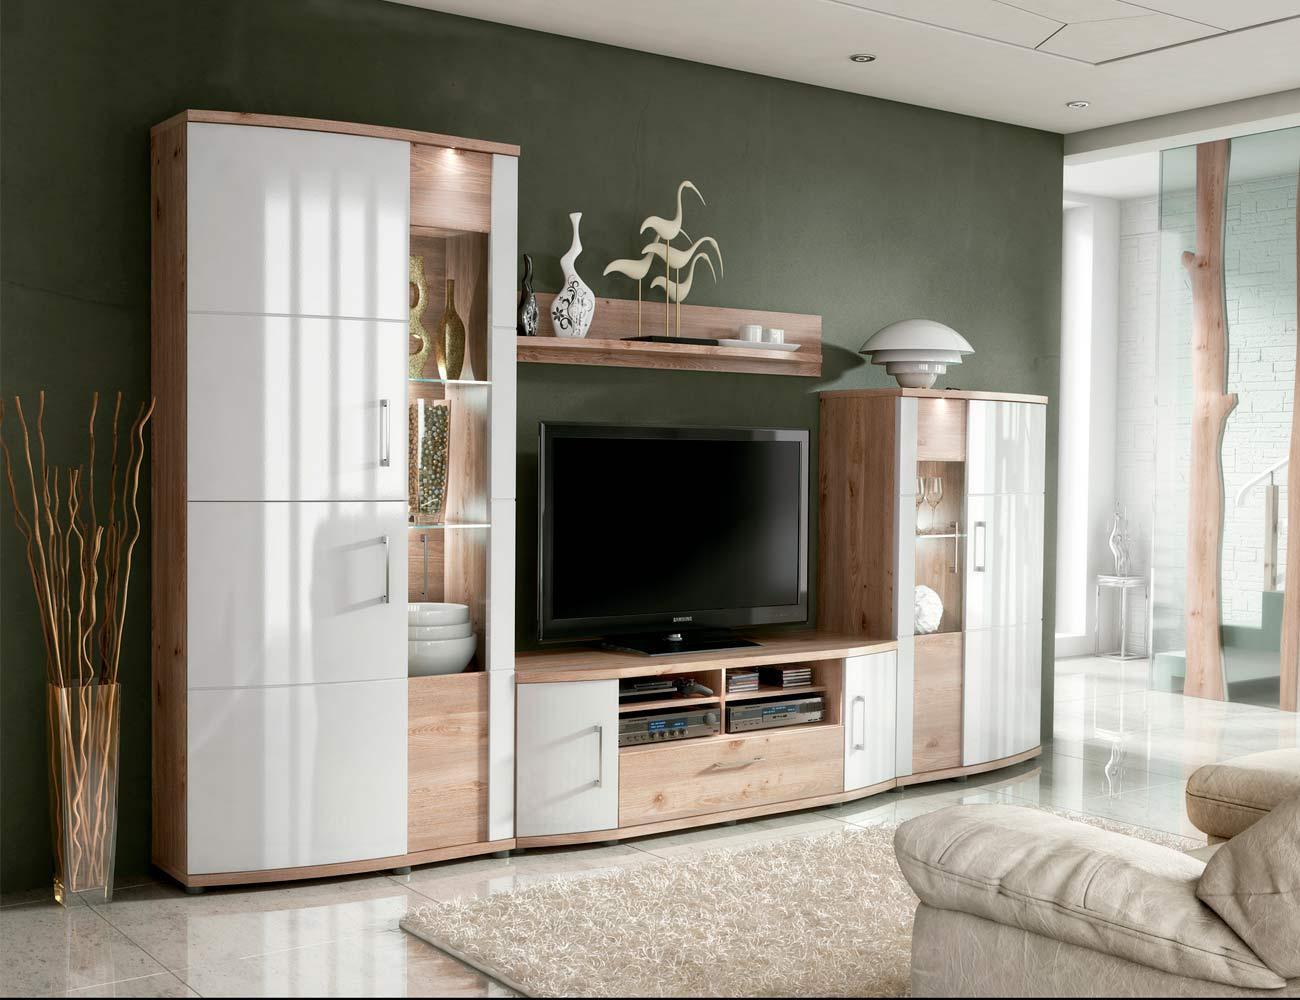 Mueble de sal n estilo moderno en madera dm con 2 vitrinas - Mueble bajo salon ...